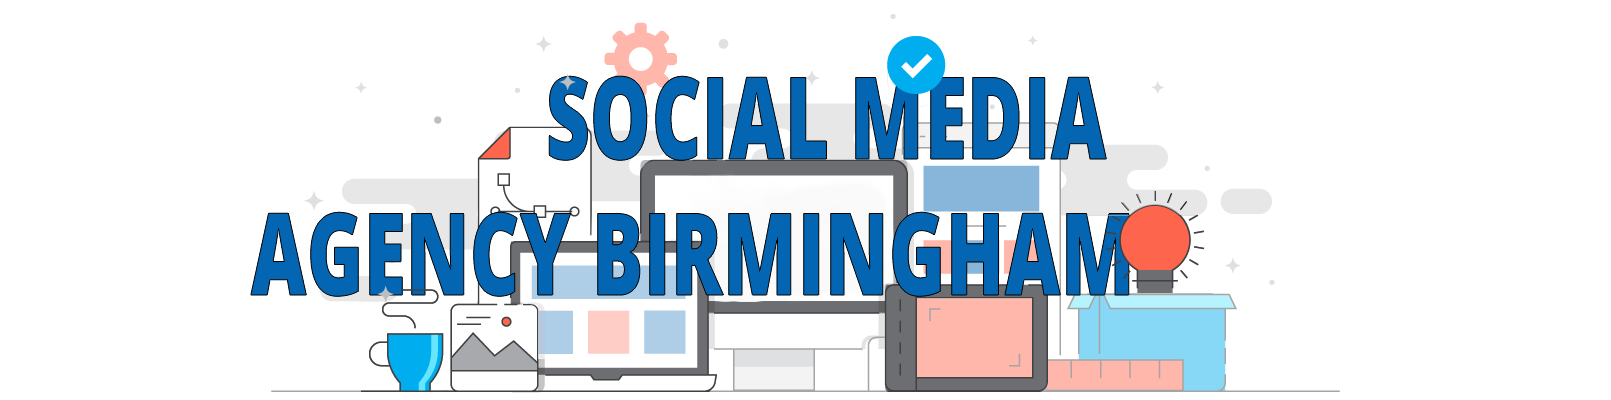 seek social social media agency birmingham header with transparent background